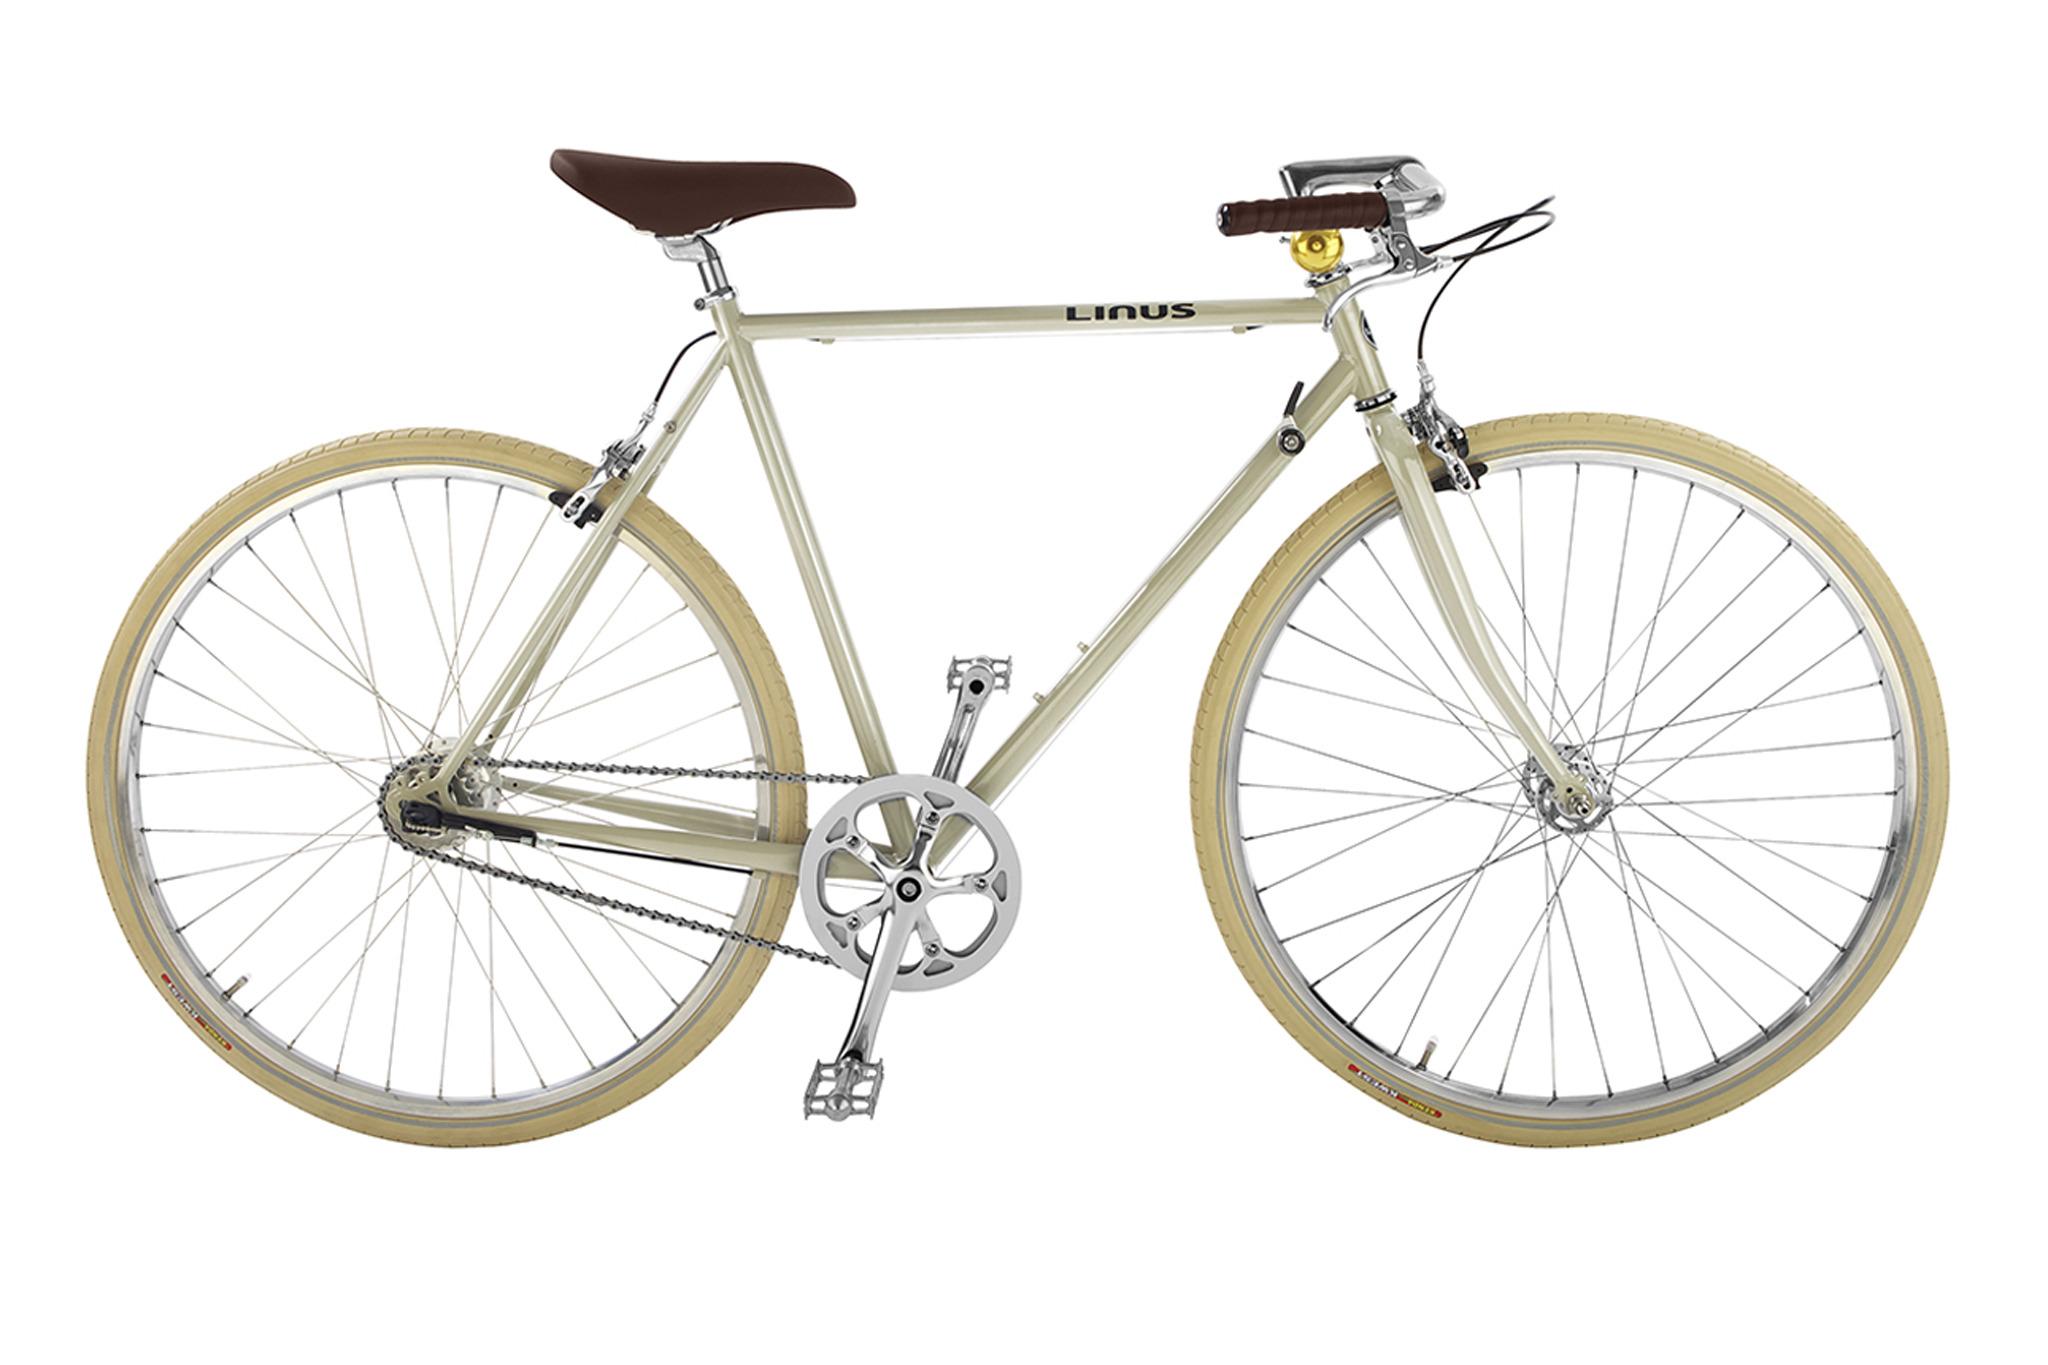 A Gaston 3 Linus Bike